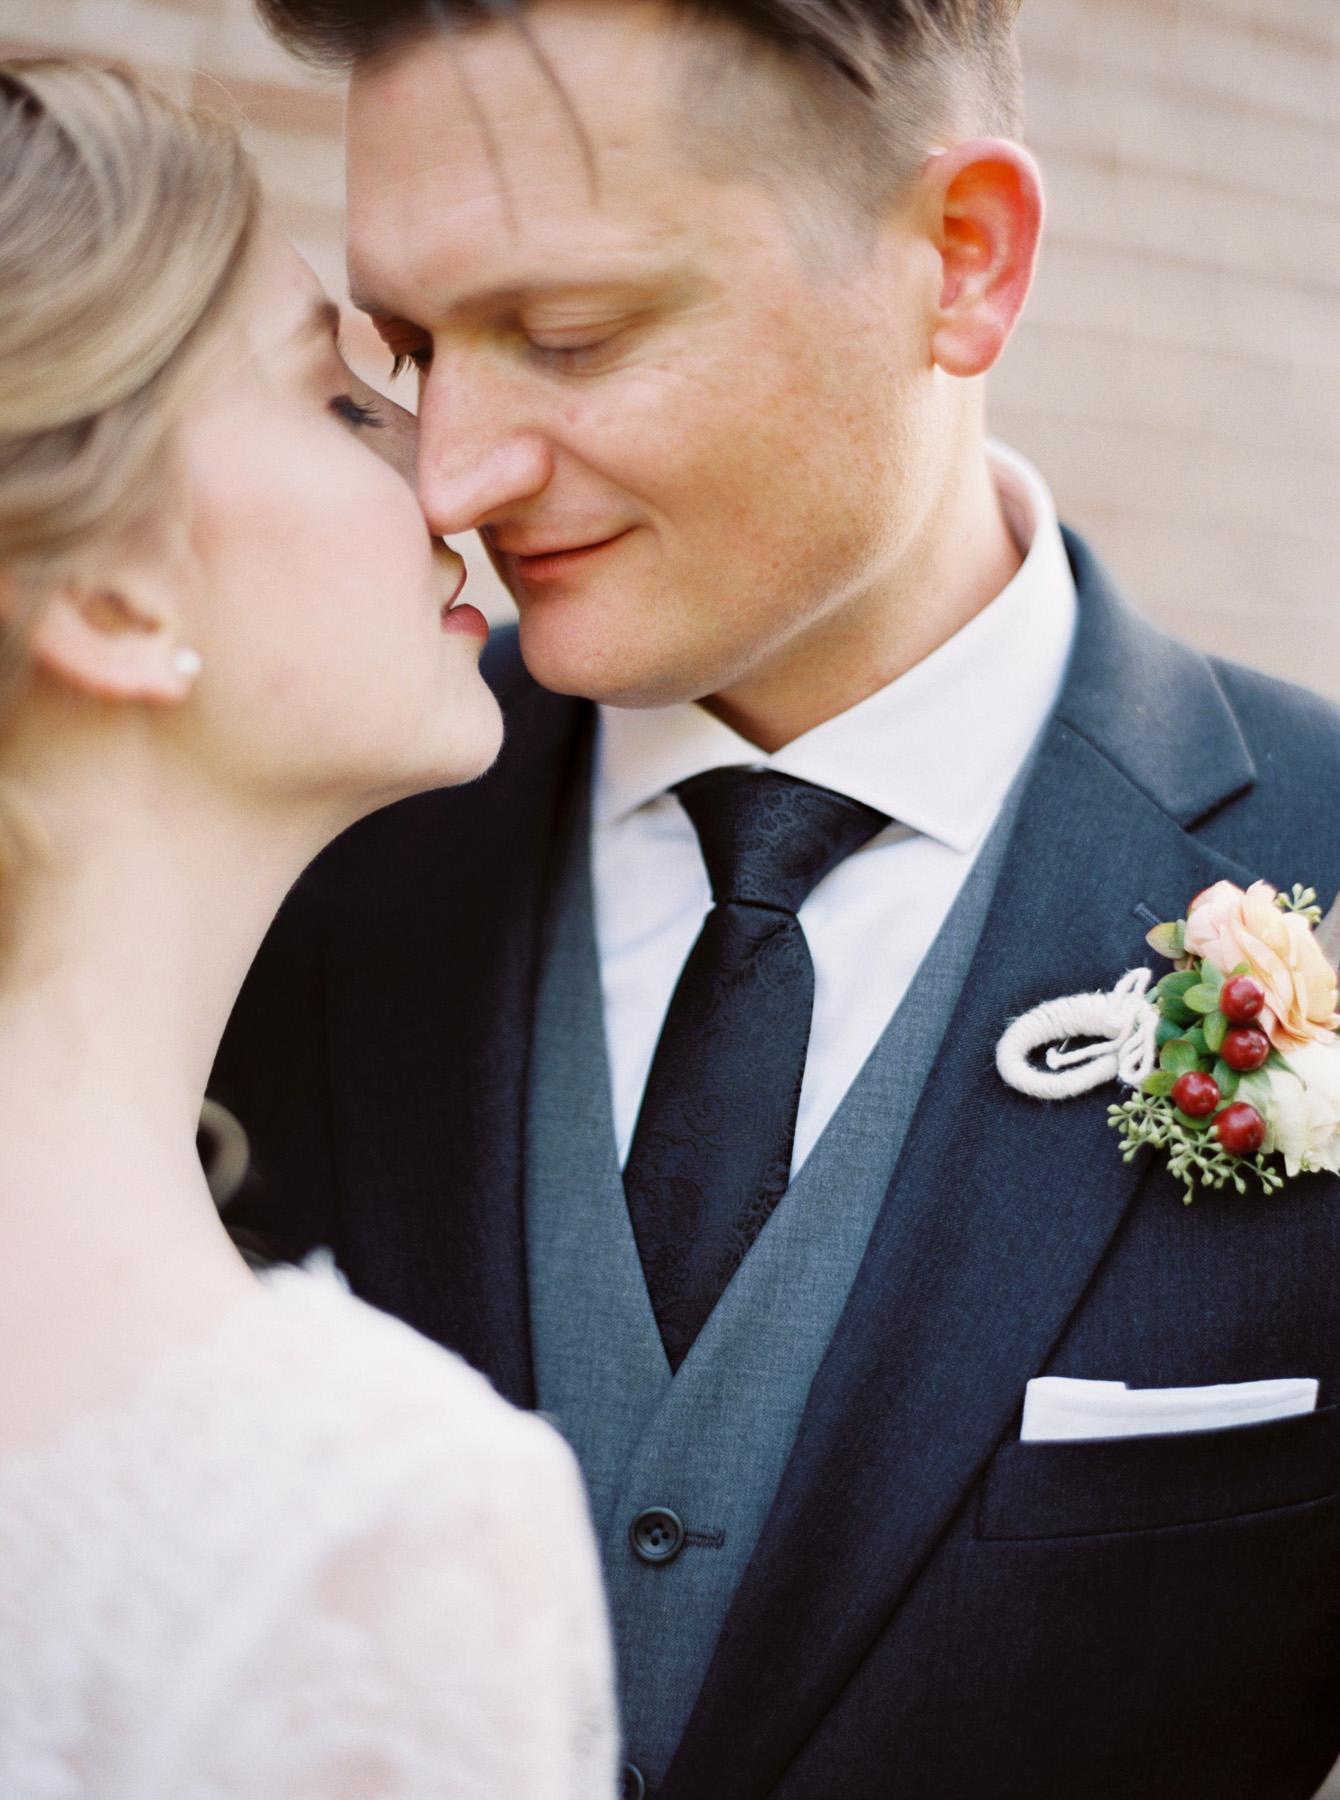 Carlos-Hernandez-Fine-Art-Film-Wedding-Photography-Edenton-North-Carolina-NC-Cotton-Gin-Inn-007